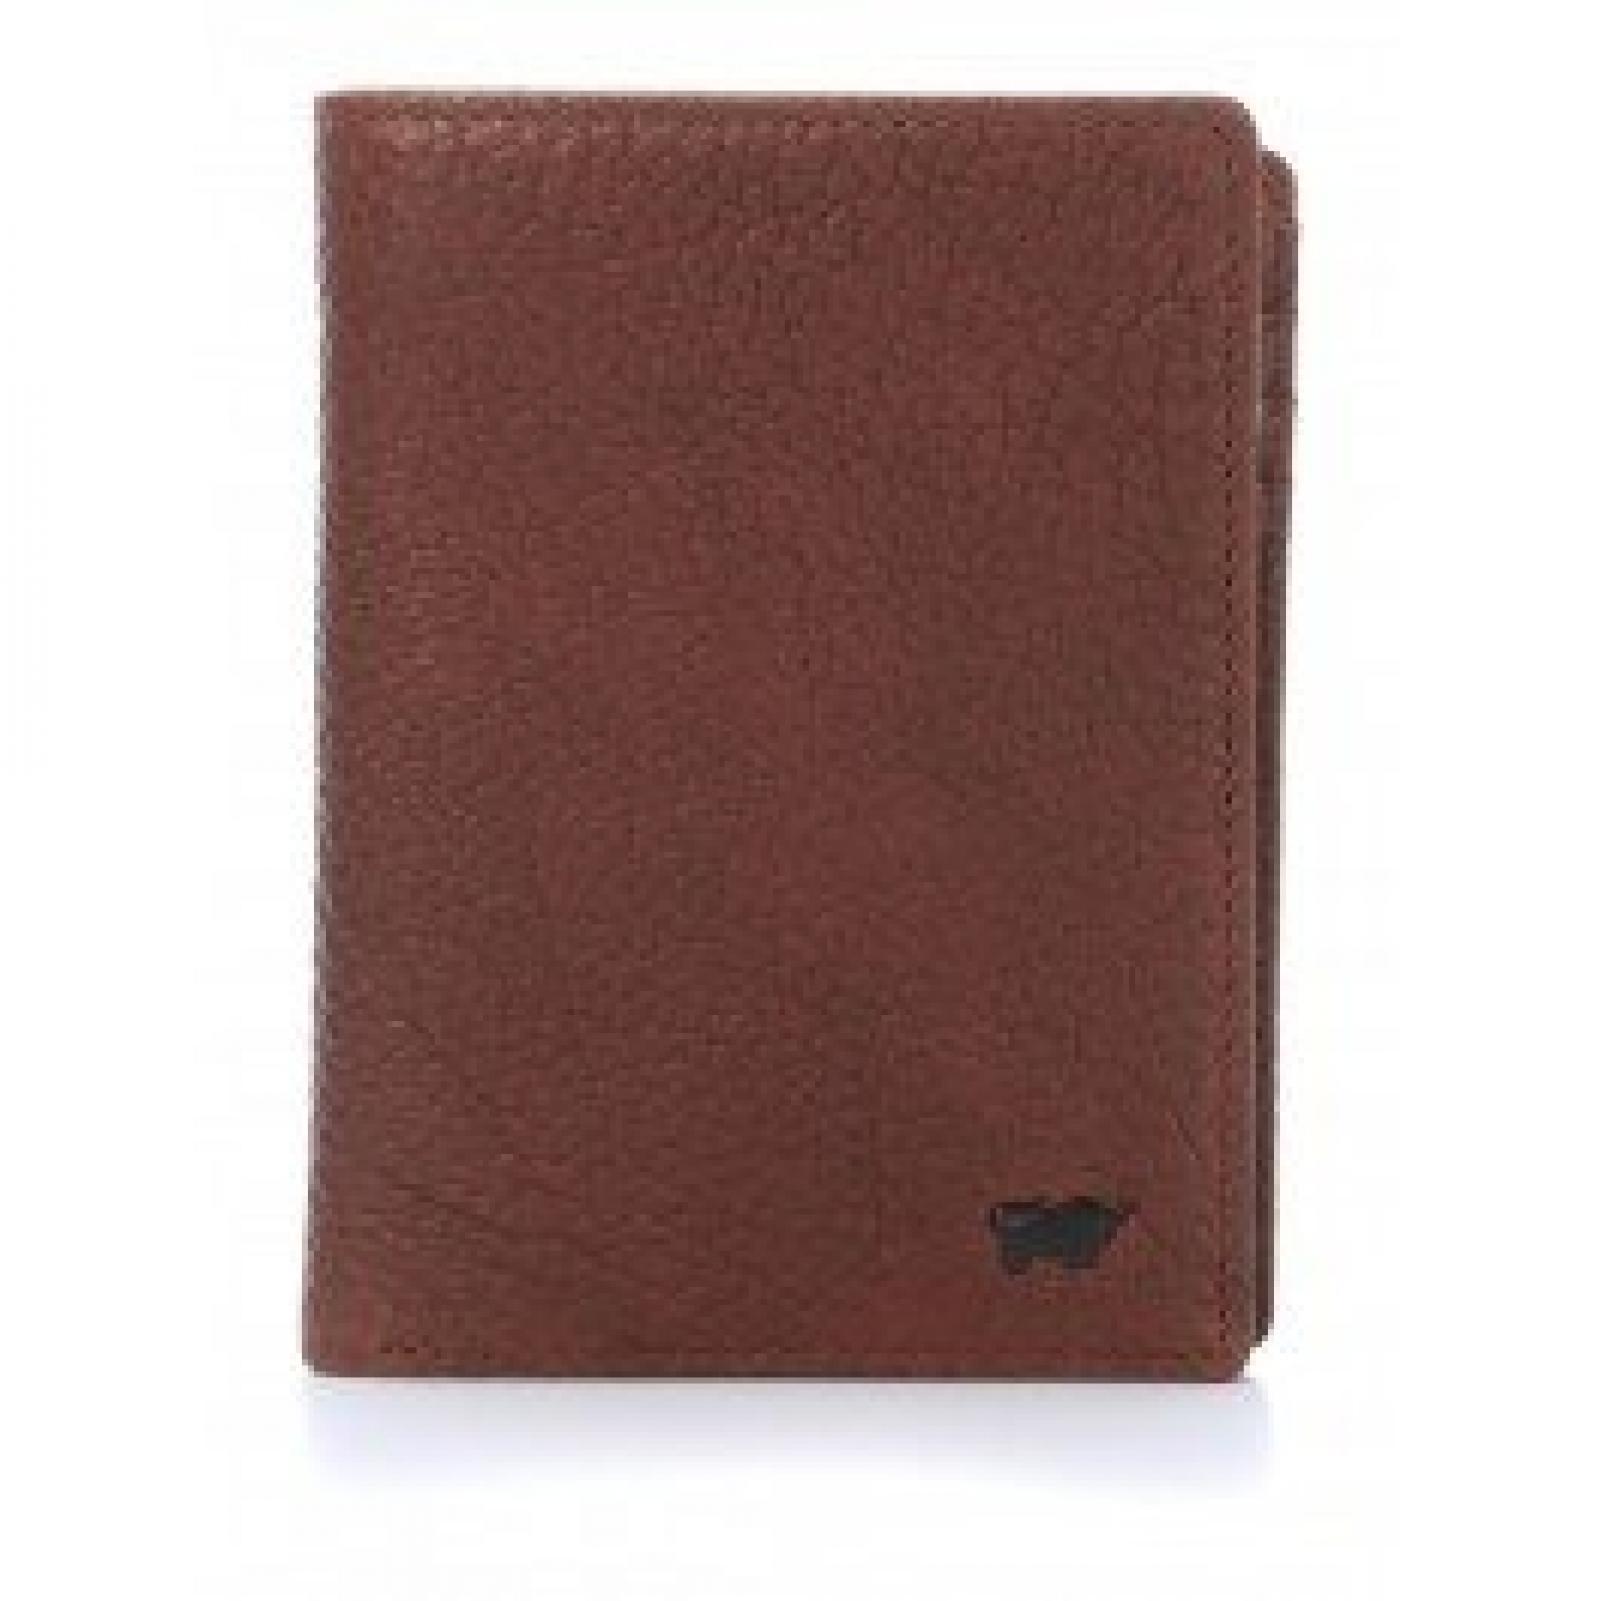 Braun Büffel Dallas Geldbörse Herren 18642-180-020